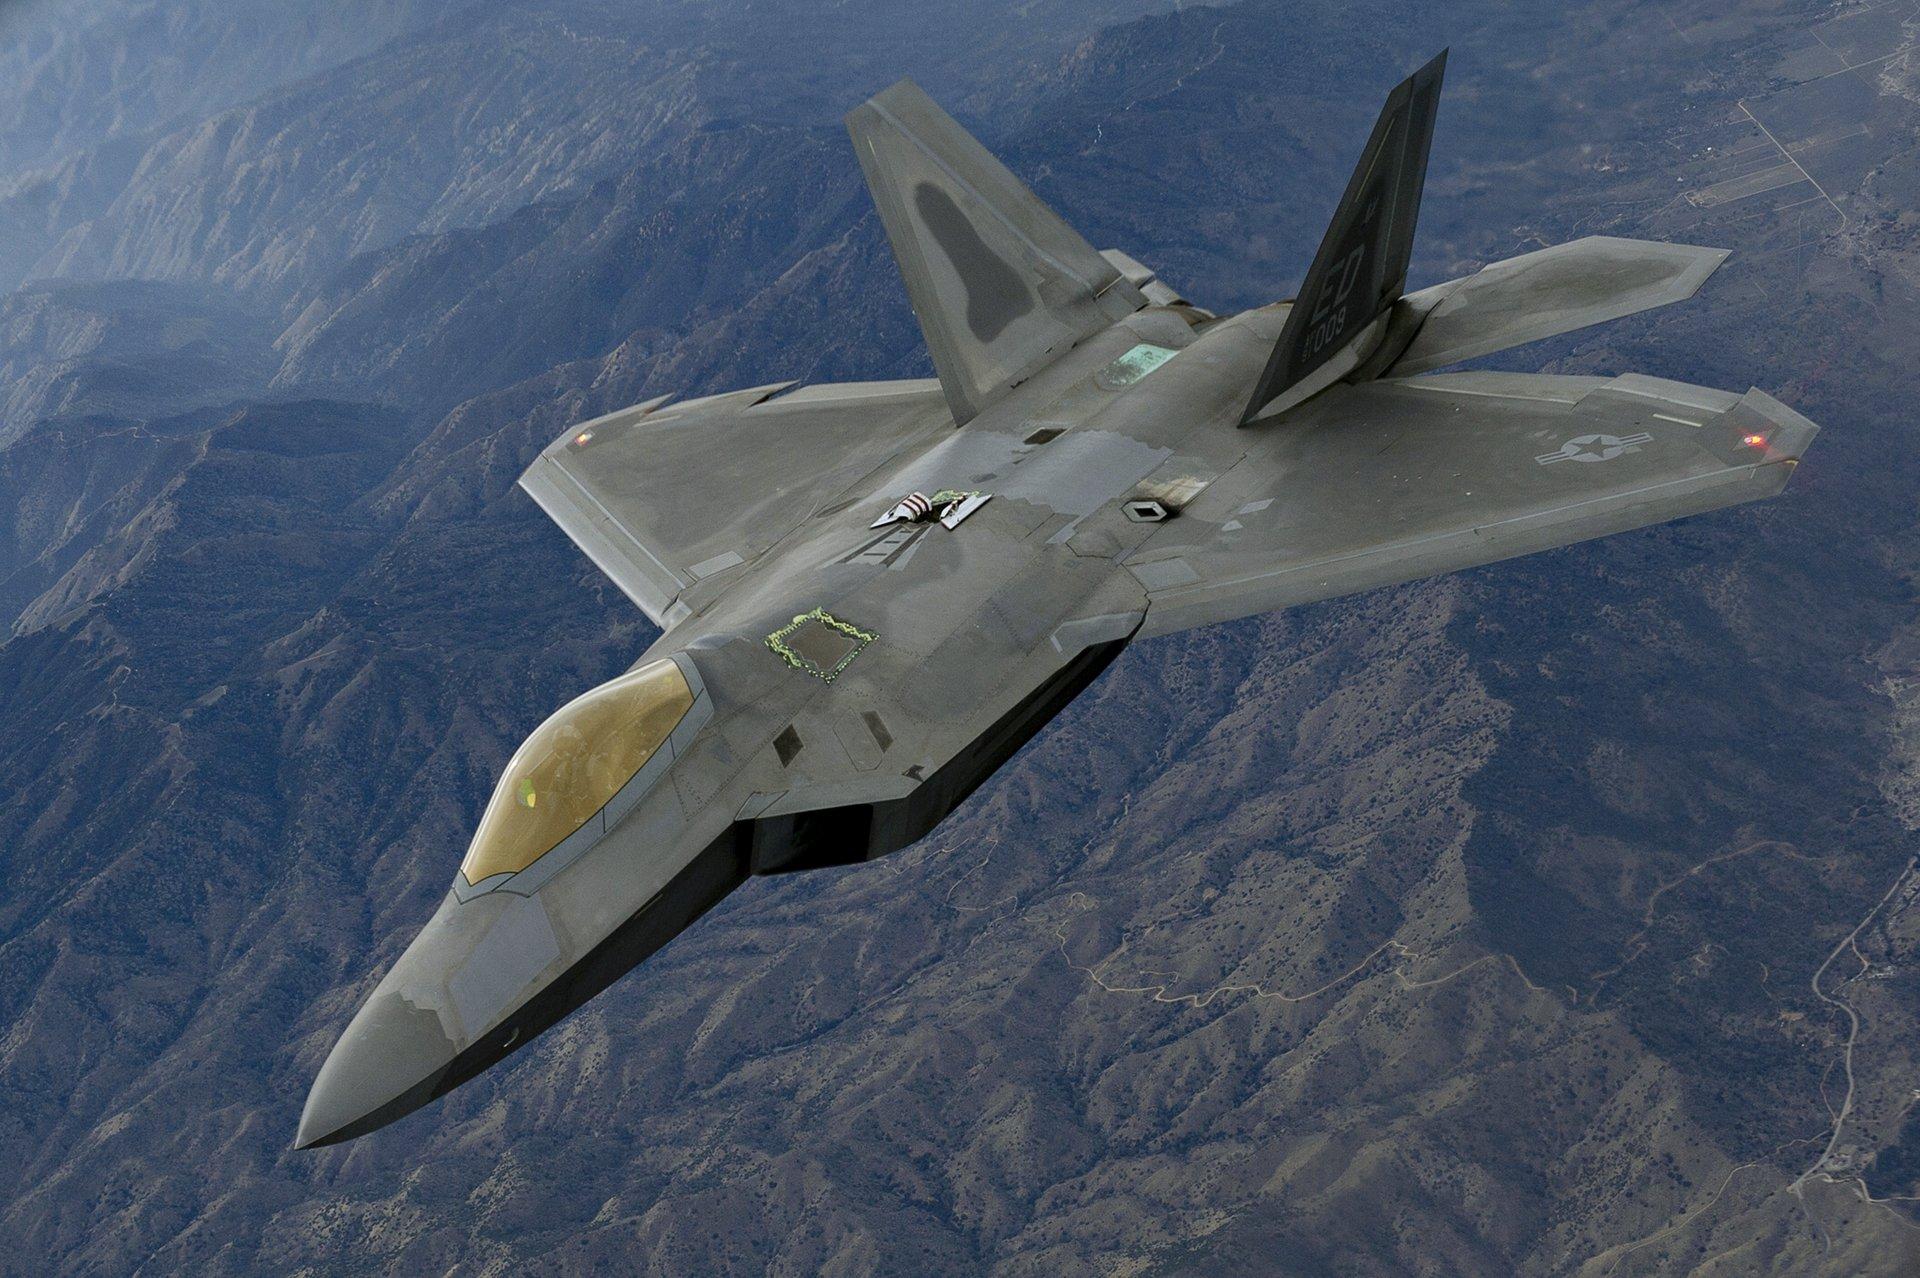 F 22 Raptor Wallpaper: Lockheed Martin F-22 Raptor 4k Ultra HD Wallpaper And